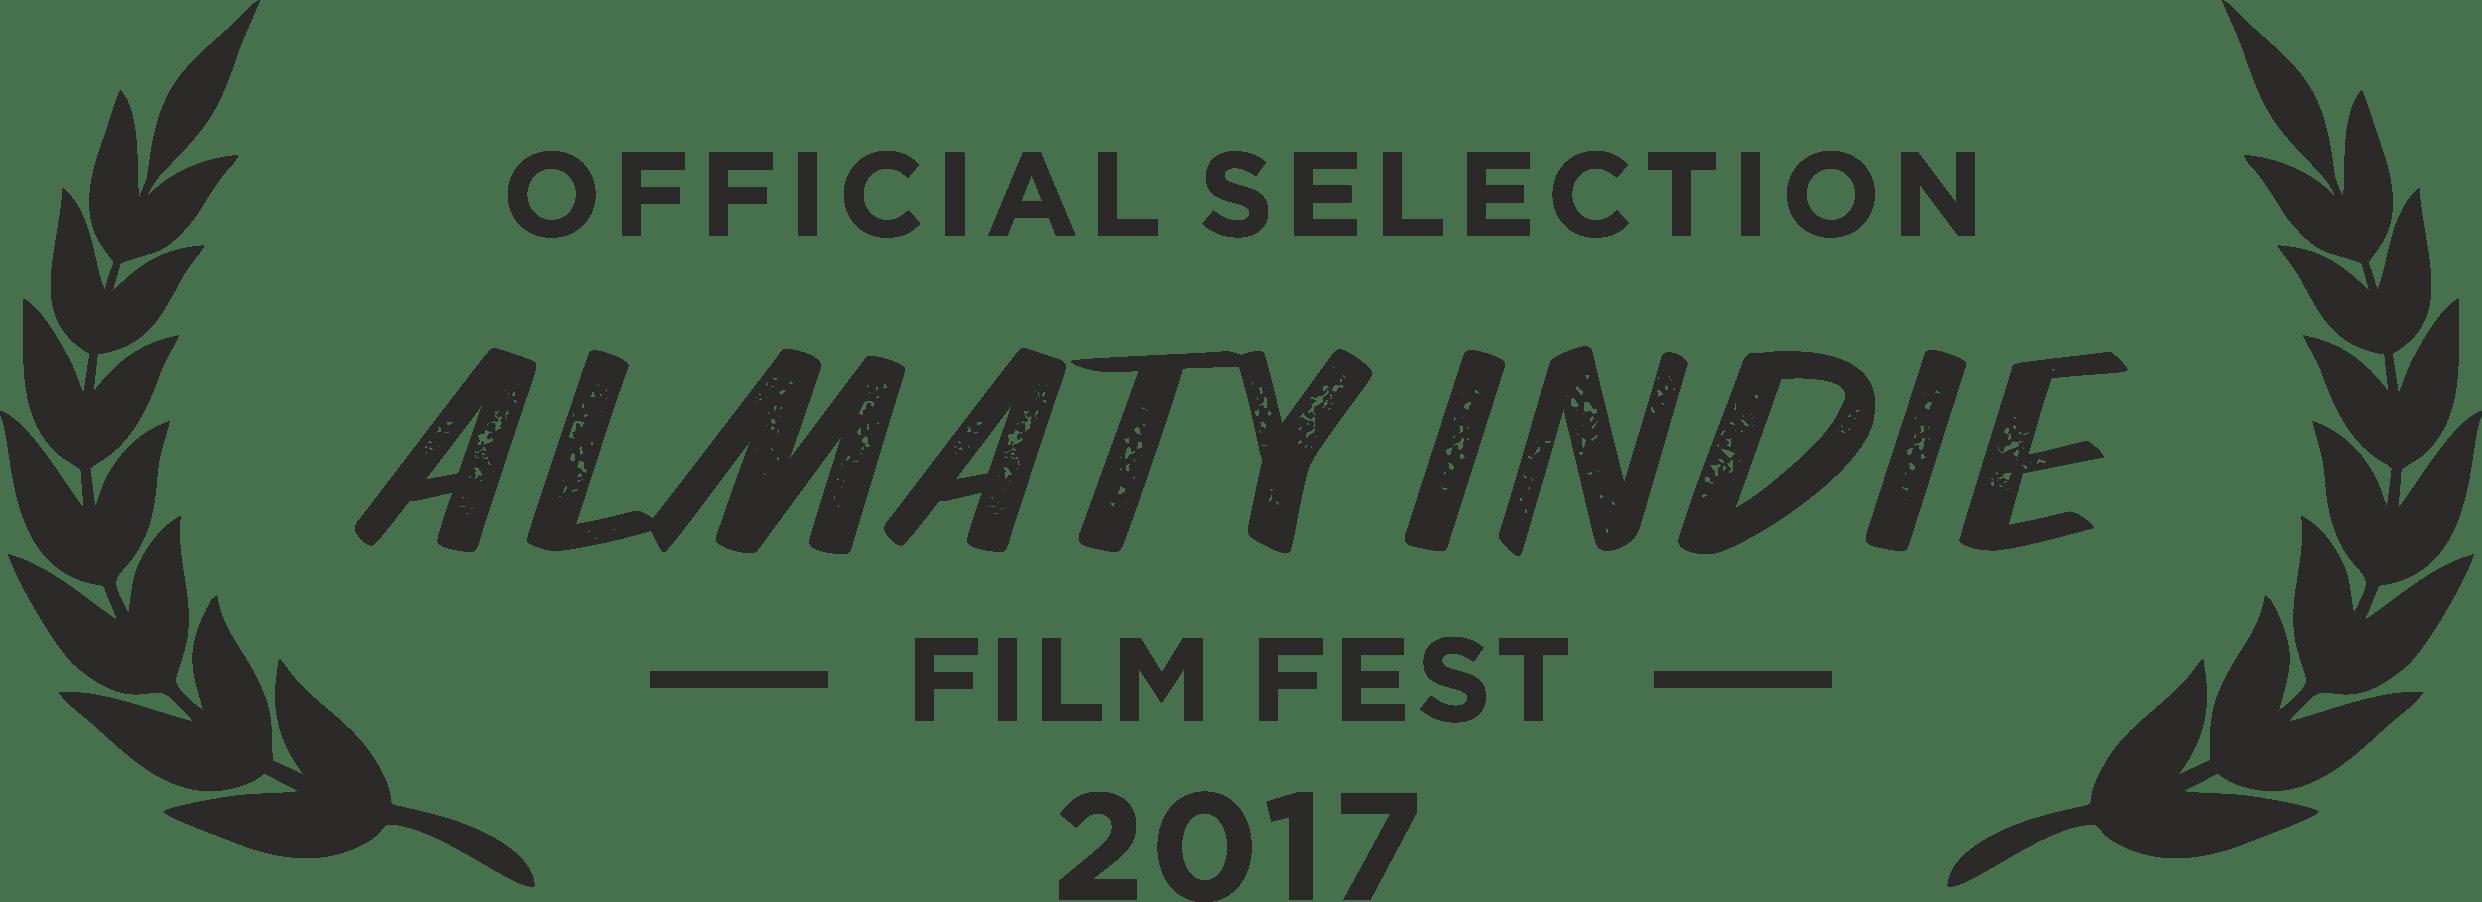 Laurel Almaty Indie Film Fest